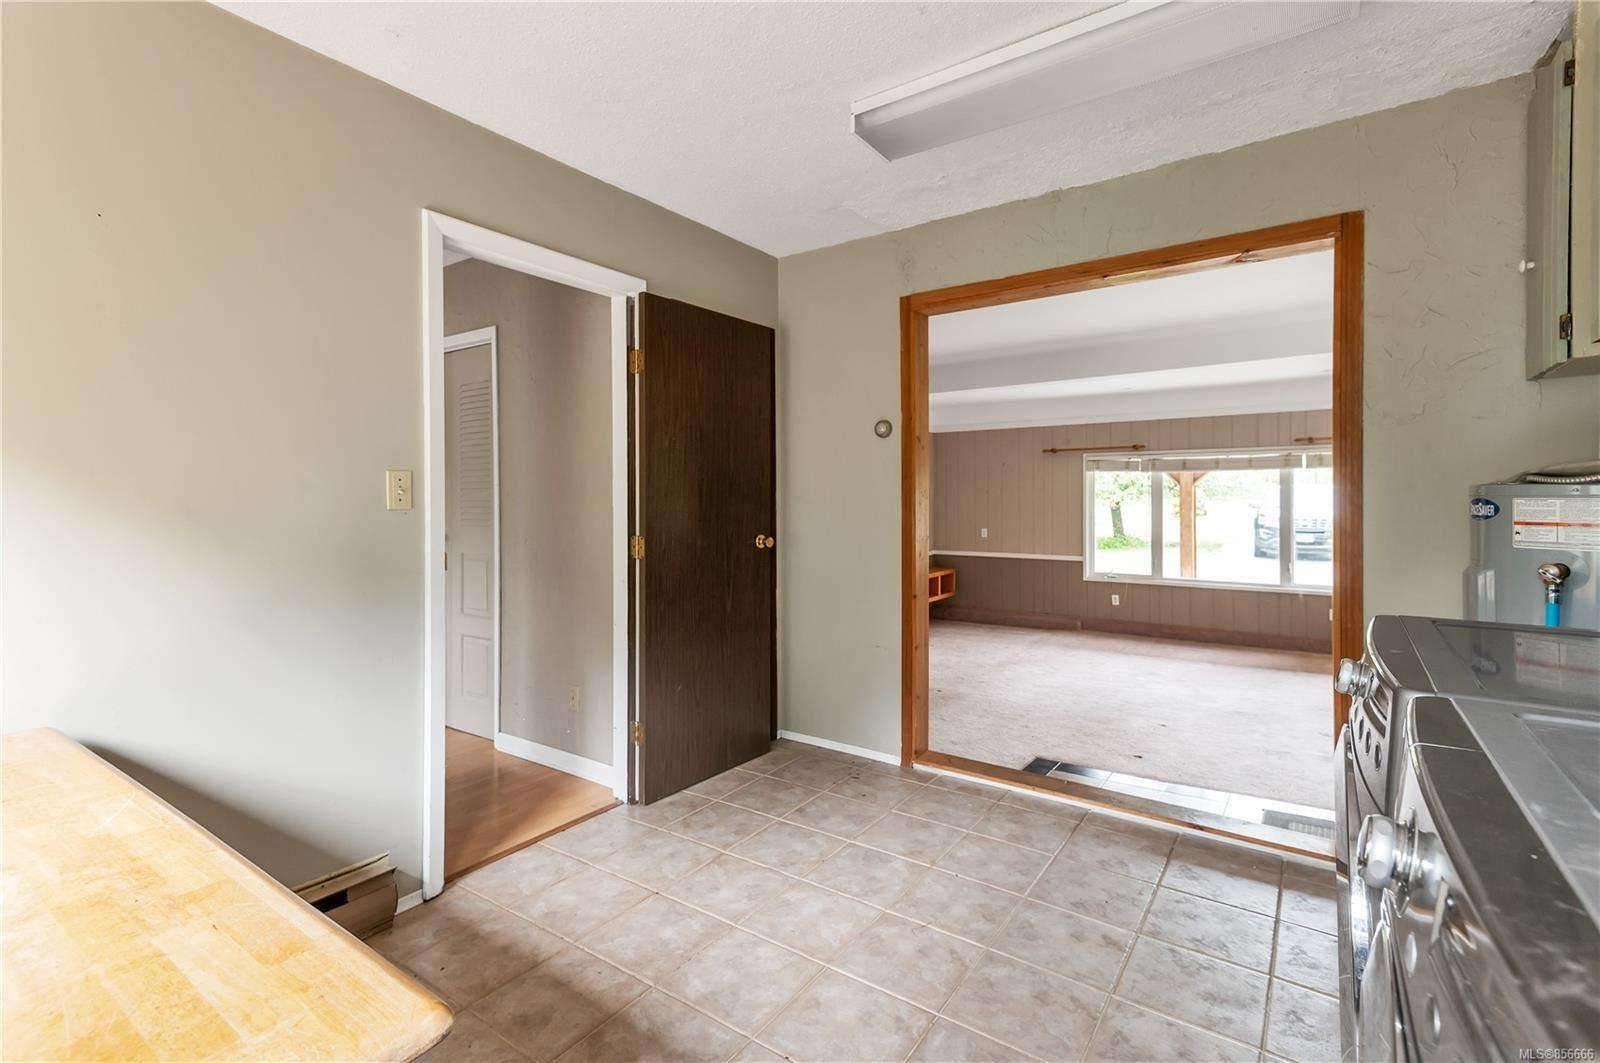 Photo 26: Photos: 2468 Oakes Rd in : CV Merville Black Creek House for sale (Comox Valley)  : MLS®# 856666